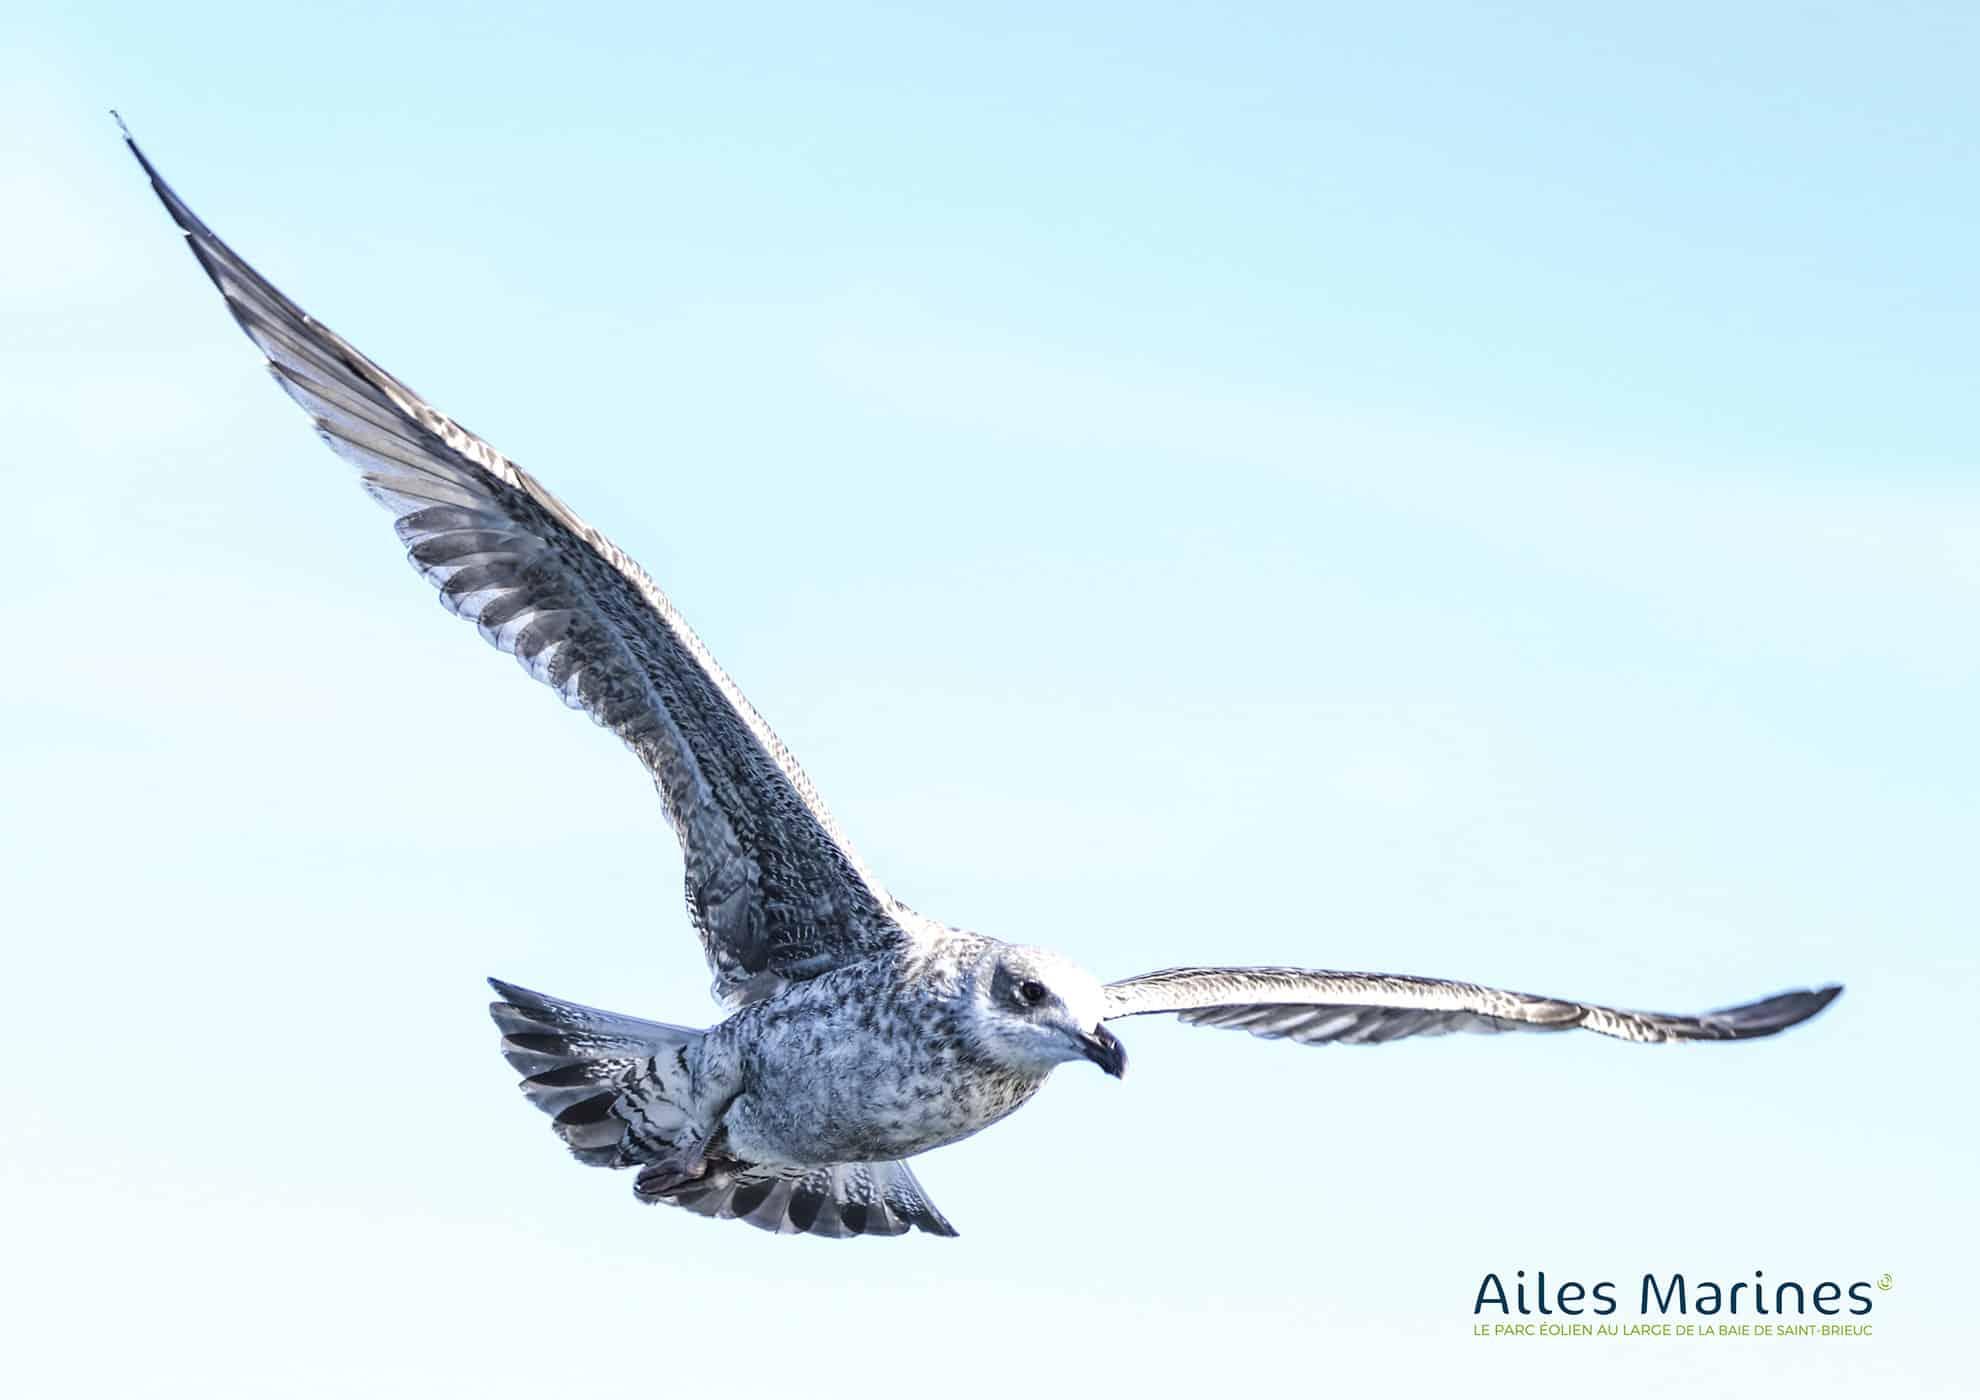 ailes-marines-goeland-juvenile-silver-in-flight